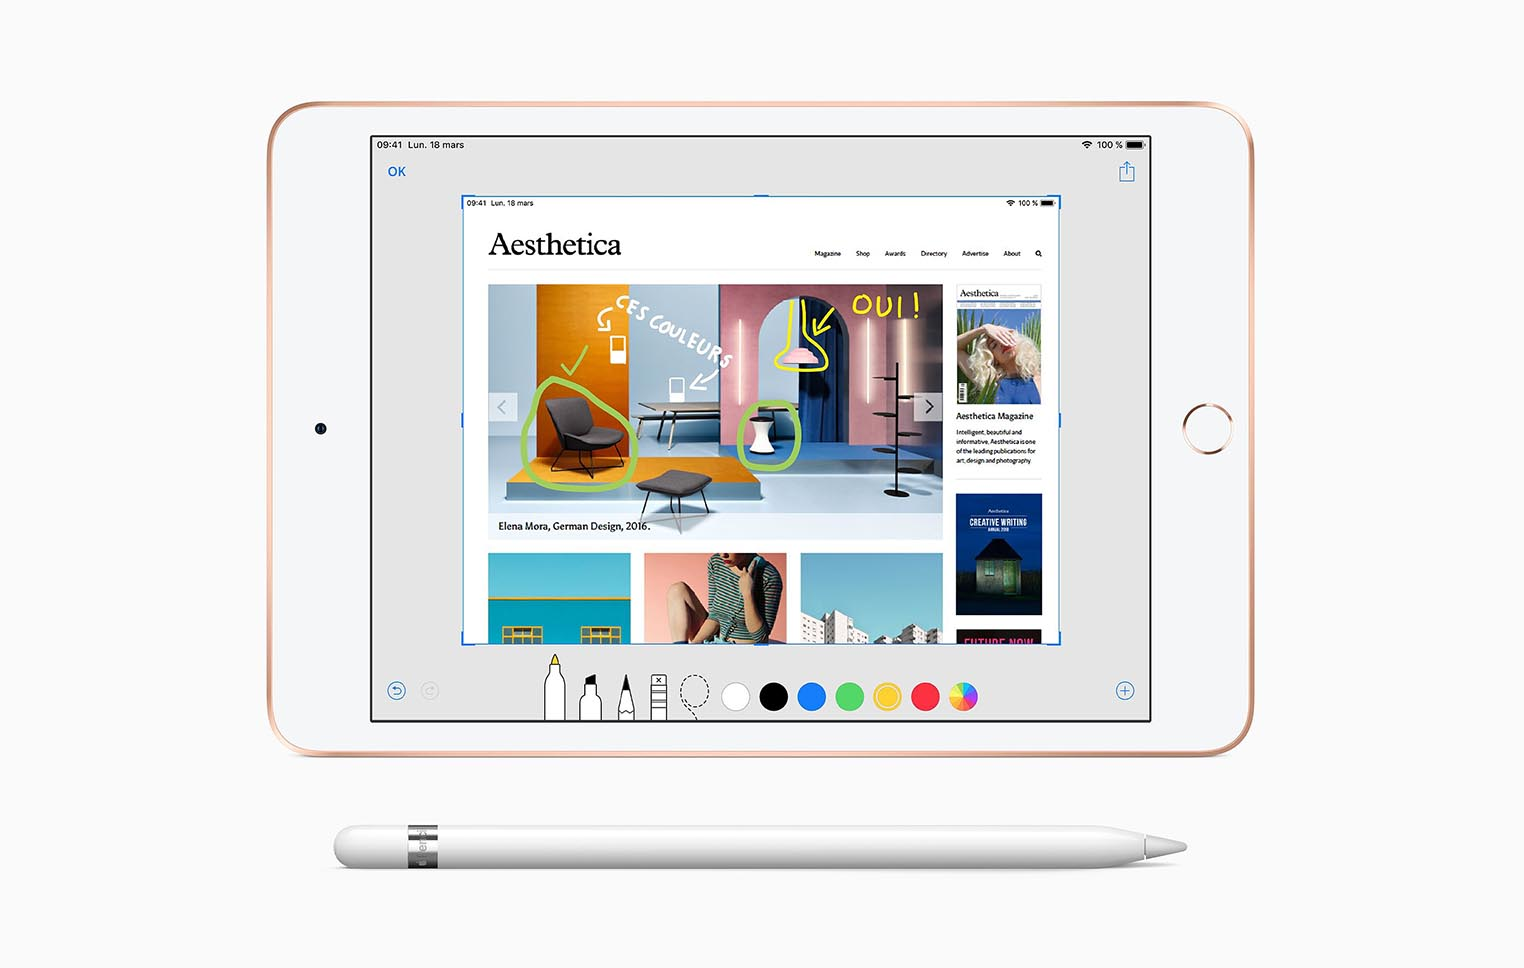 iPad mini Apple Pencil